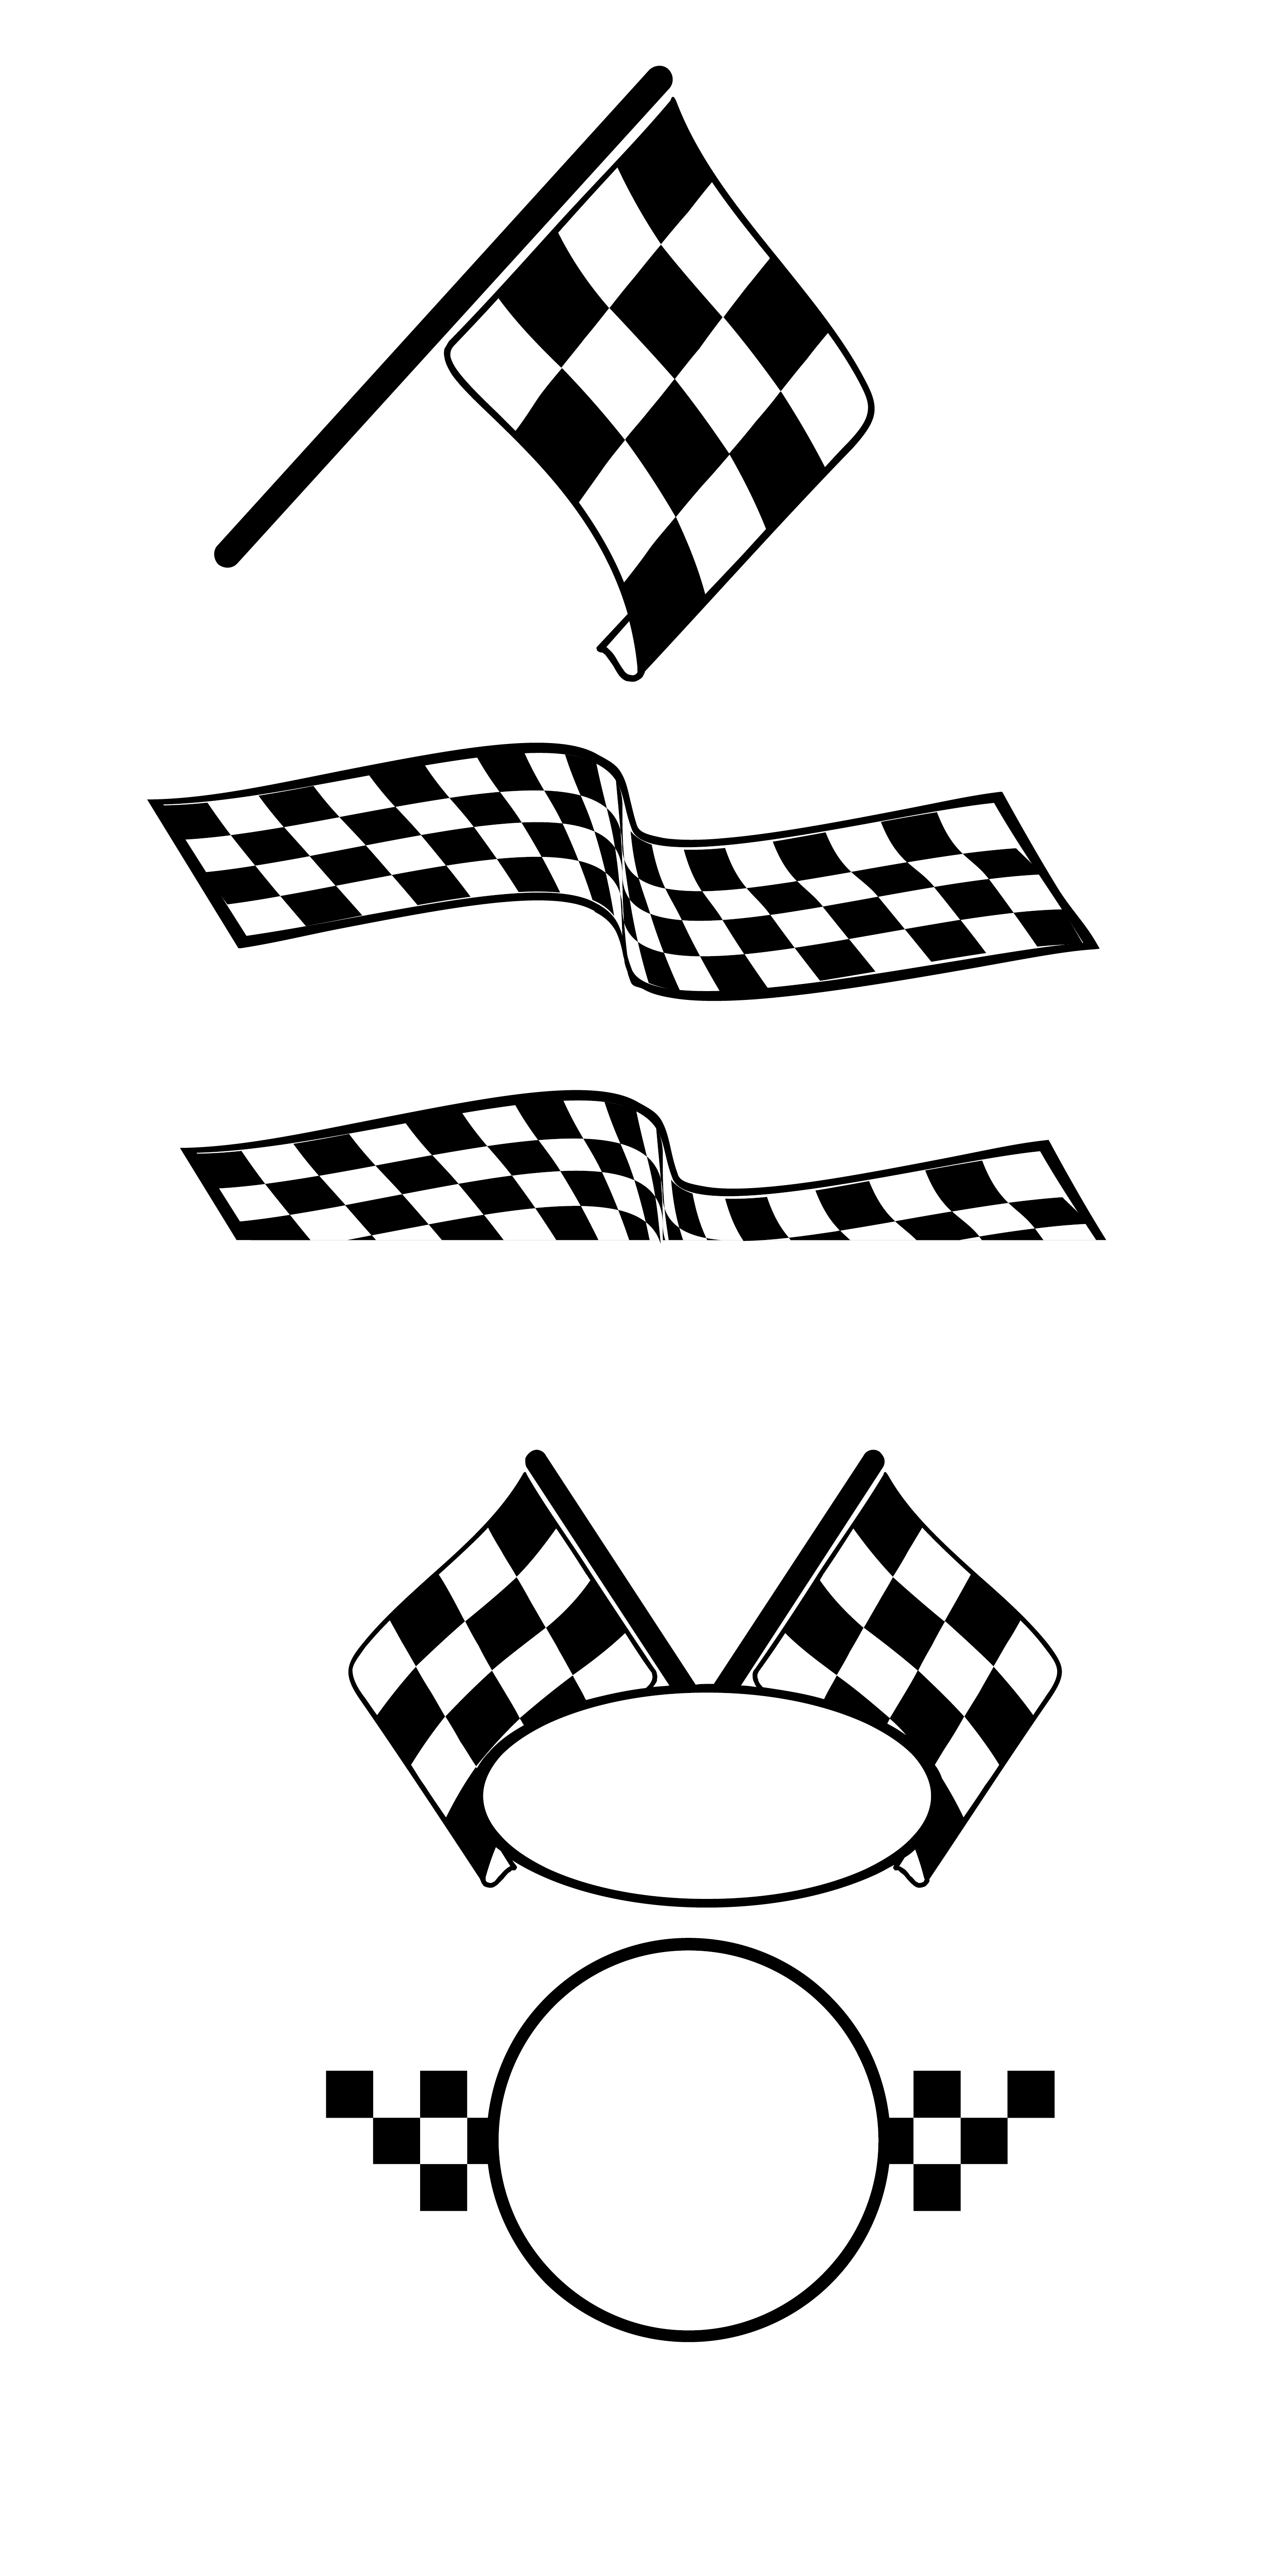 Car race flags clip art free download png files, Free CLip Art.